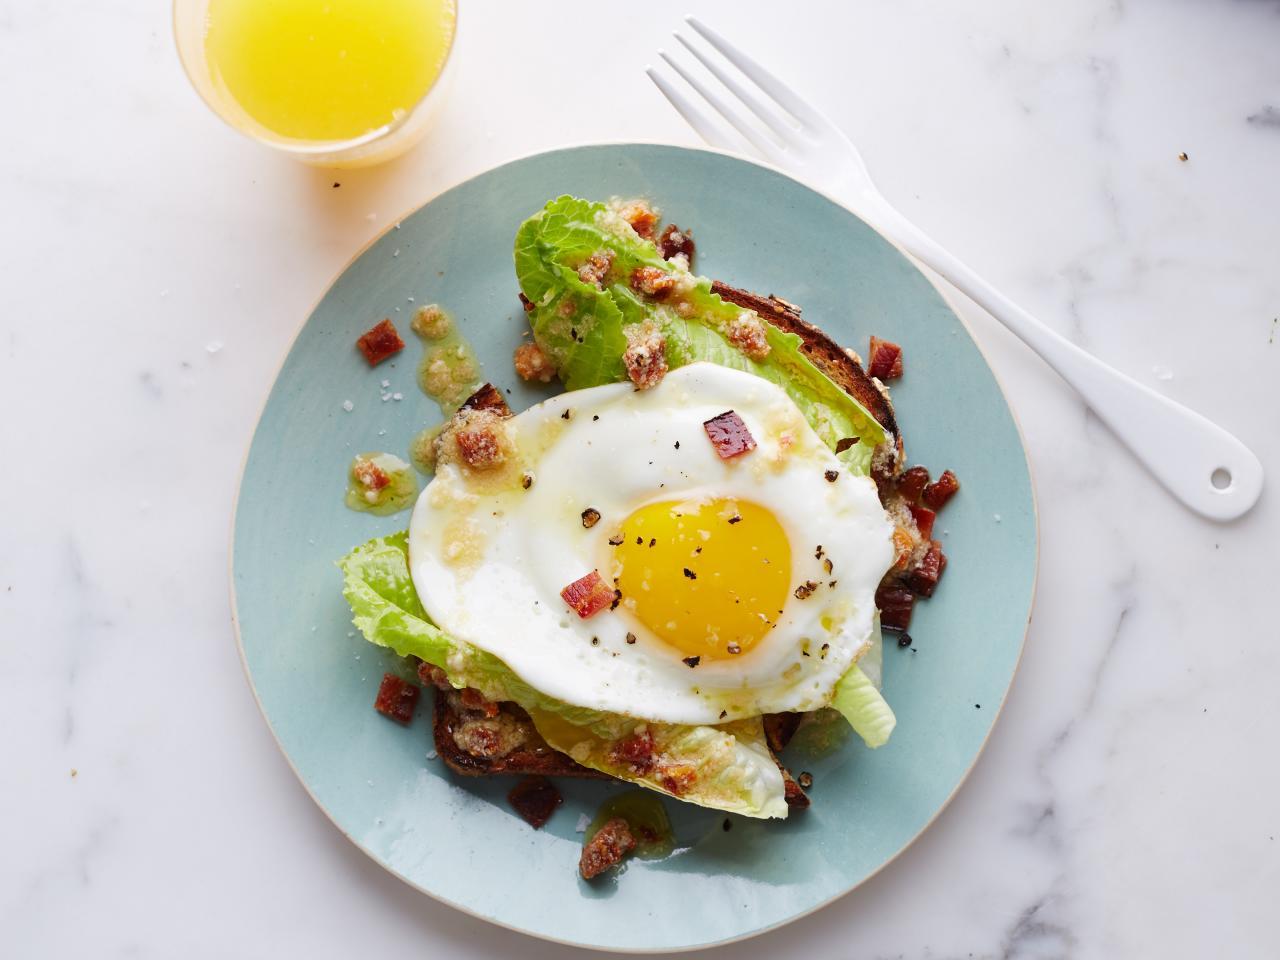 Healthy ways to keep breakfast interesting fn dish behind the healthy ways to keep breakfast interesting forumfinder Choice Image